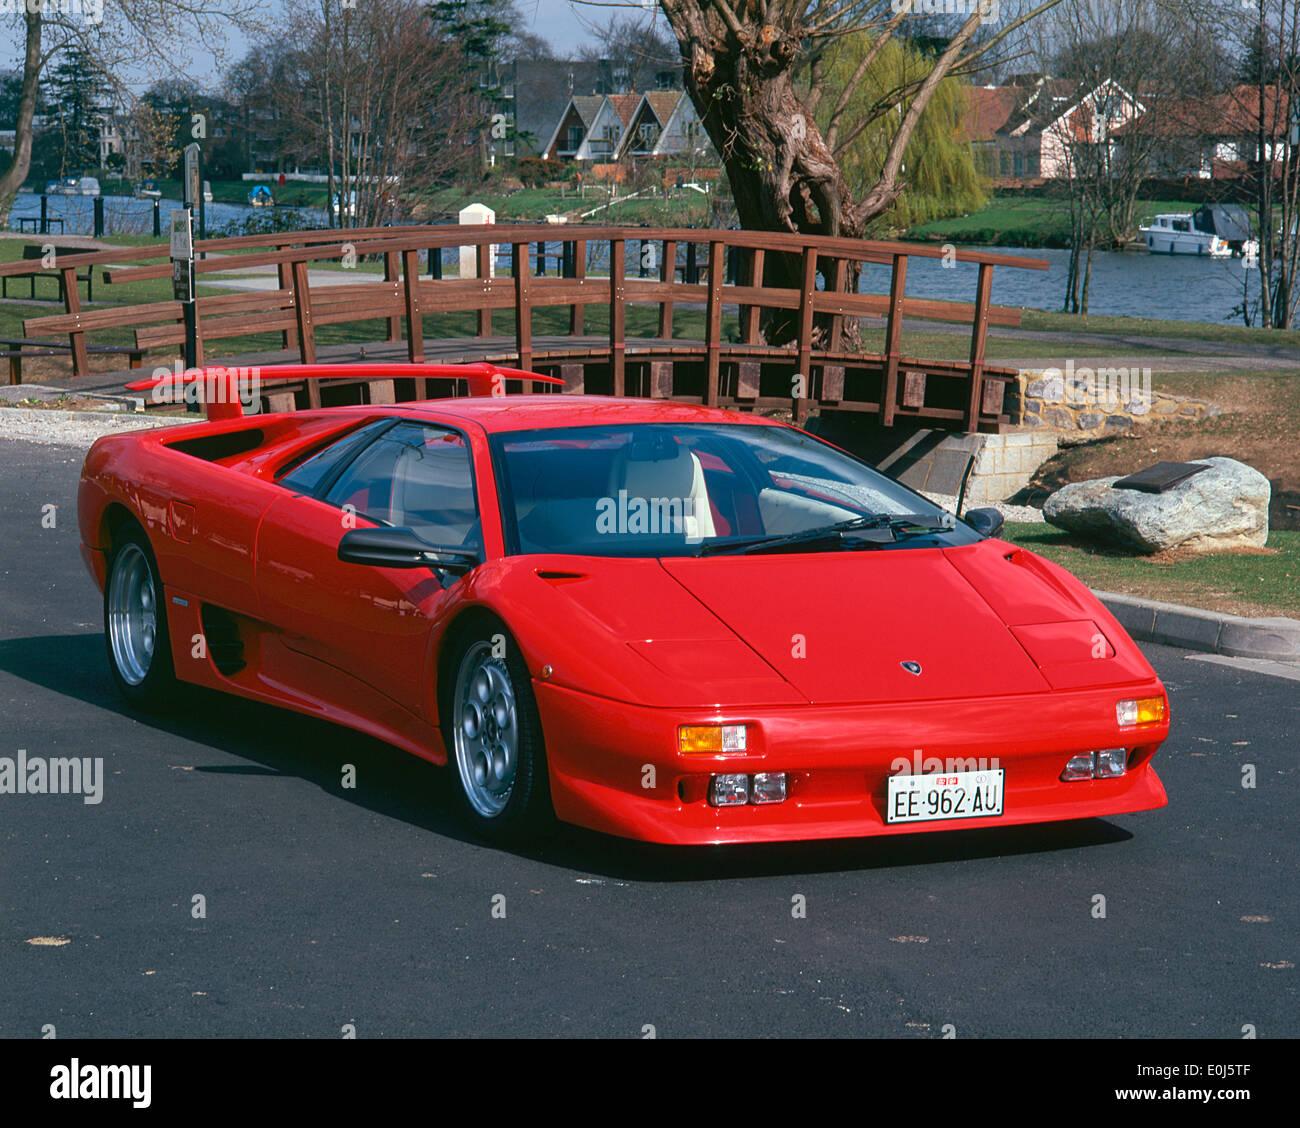 Lamborghini Diablo: Lamborghini Diablo Stock Photos & Lamborghini Diablo Stock